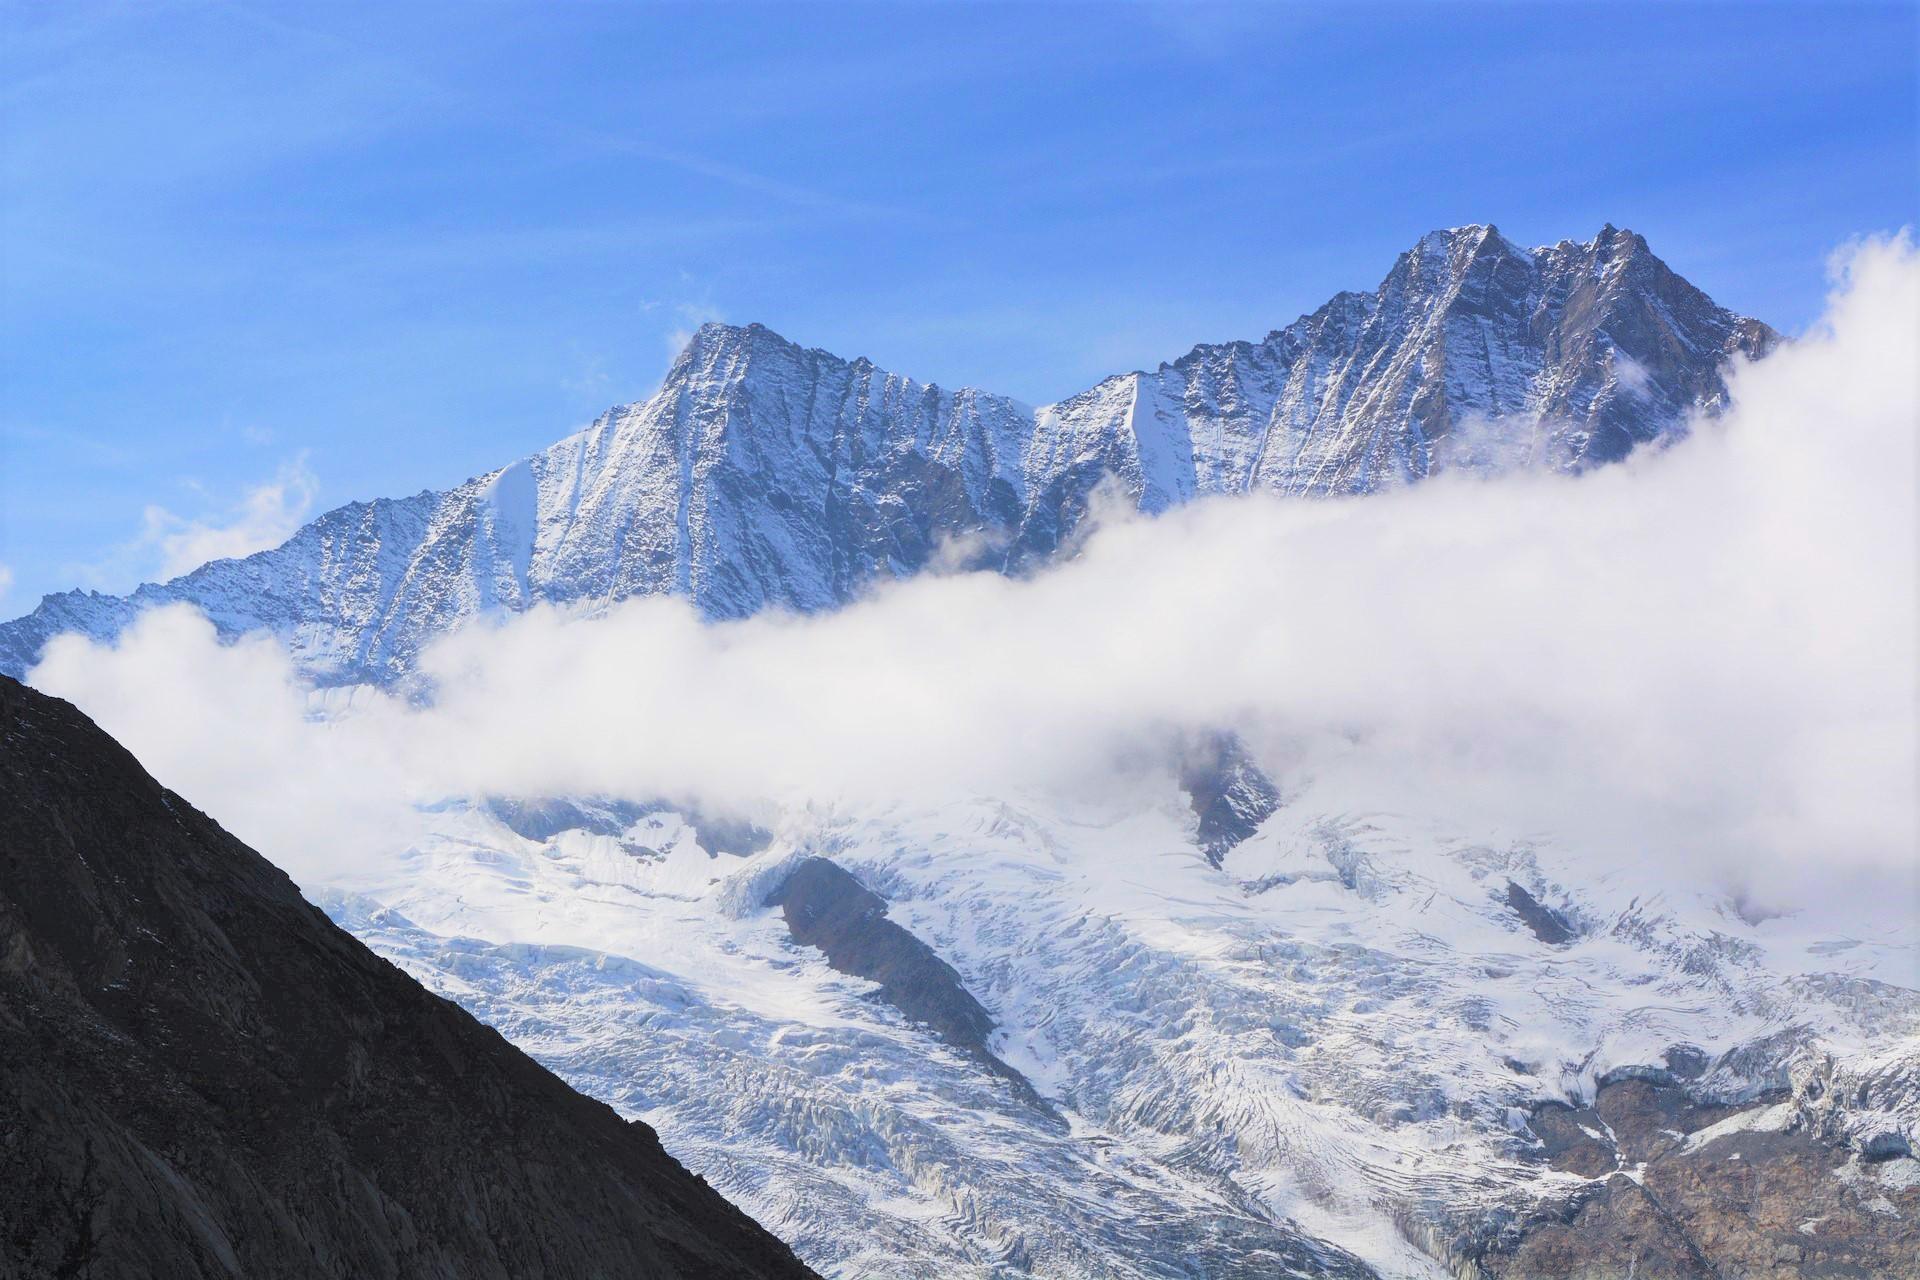 Saas Fee Mountains: Skiing In December